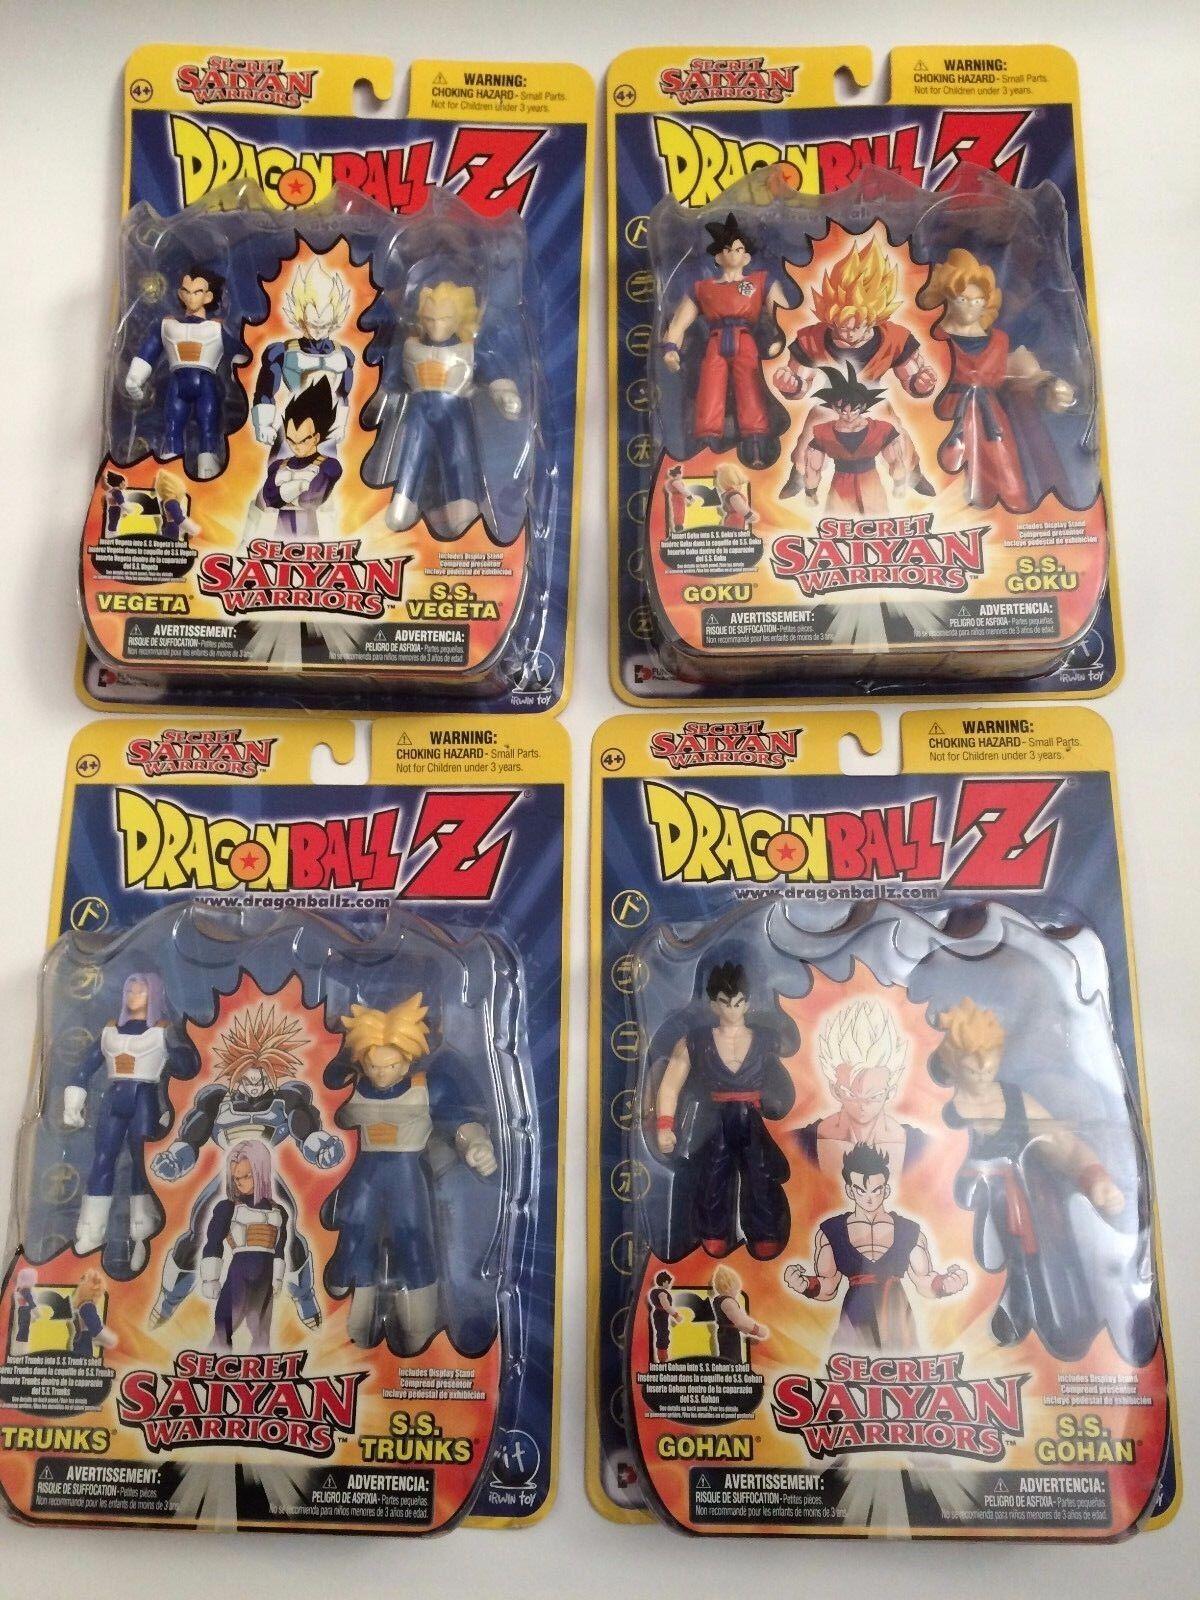 DragonBall Z Secret Saiyan Warriors- Goku, Vegeta, Trunks,Gohan